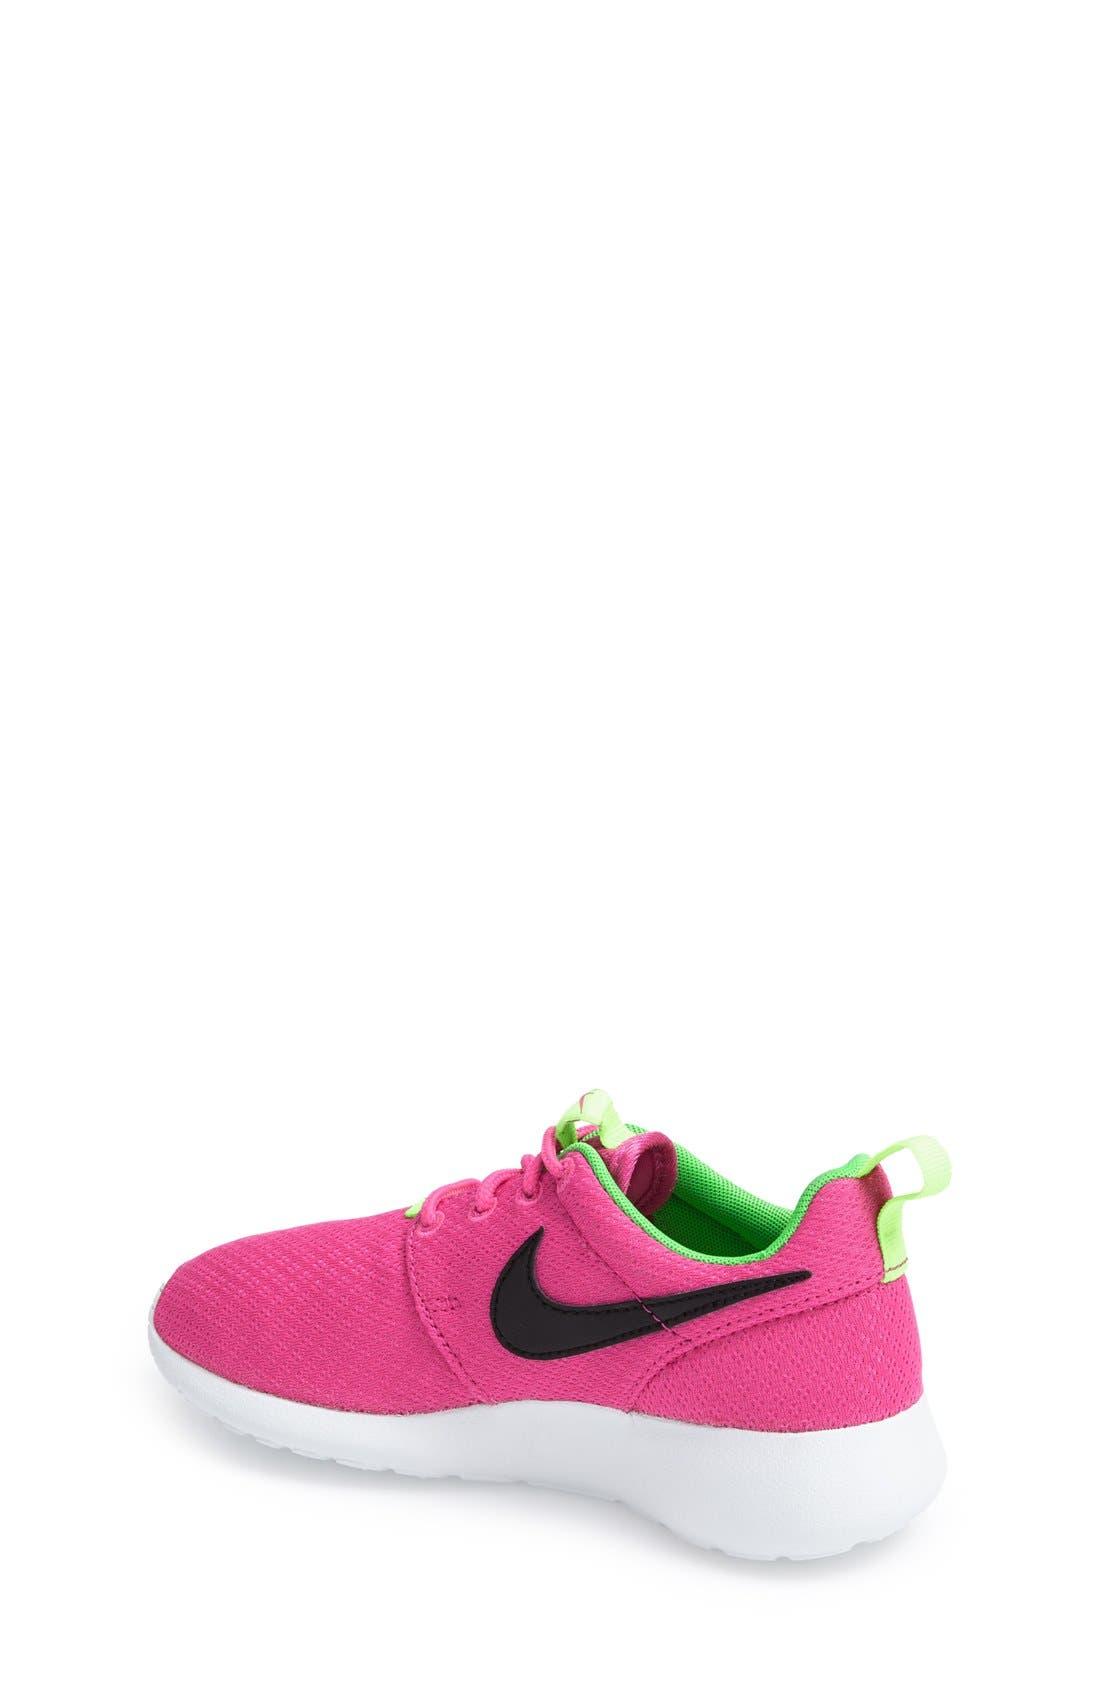 'Roshe Run' Athletic Shoe,                             Alternate thumbnail 141, color,